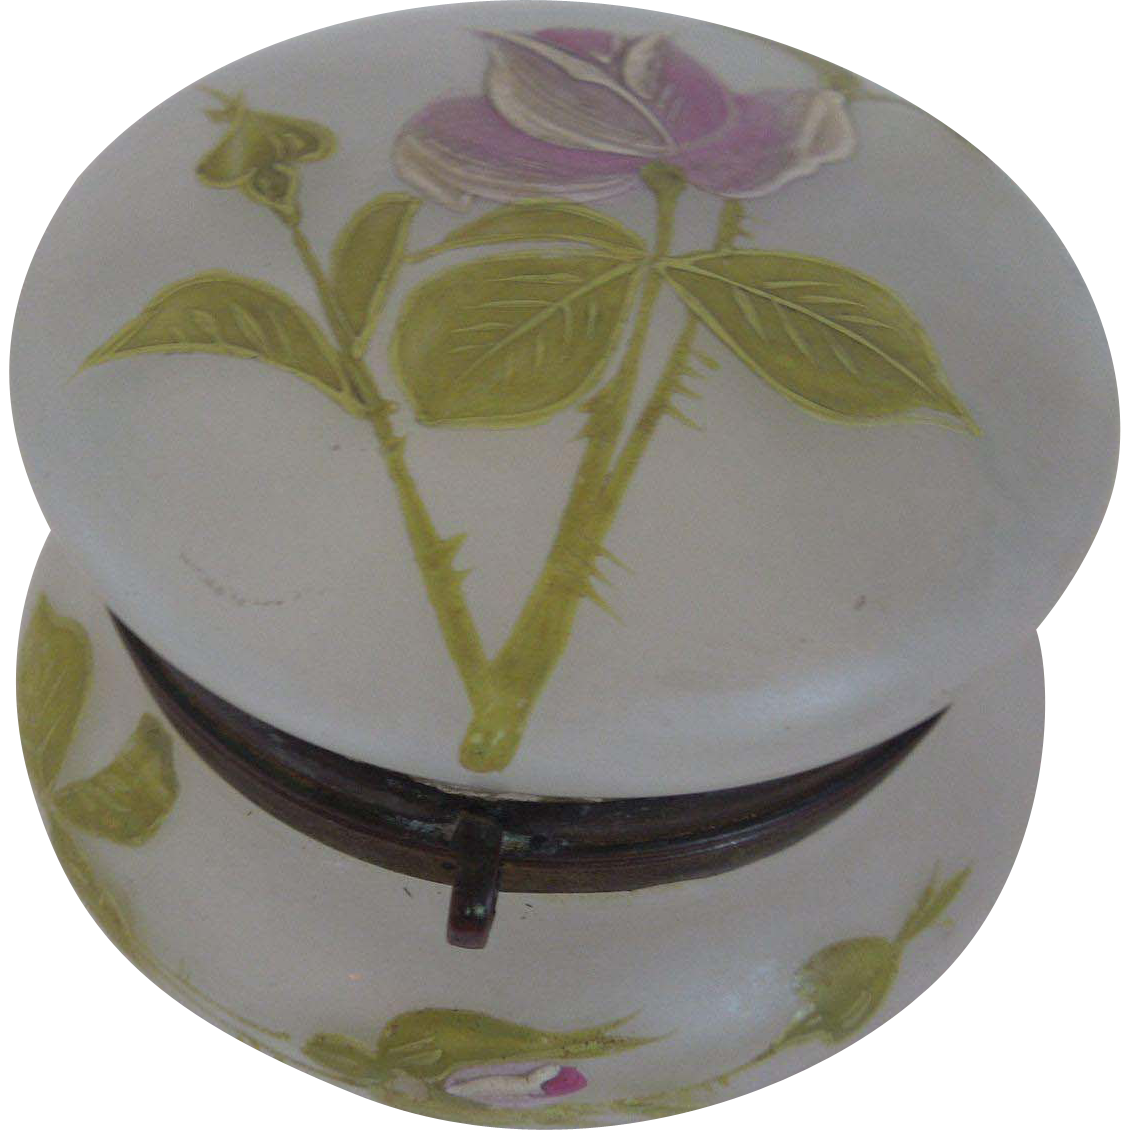 19th Century Moser Enamel Bonbon Or Powder Jar With Rose